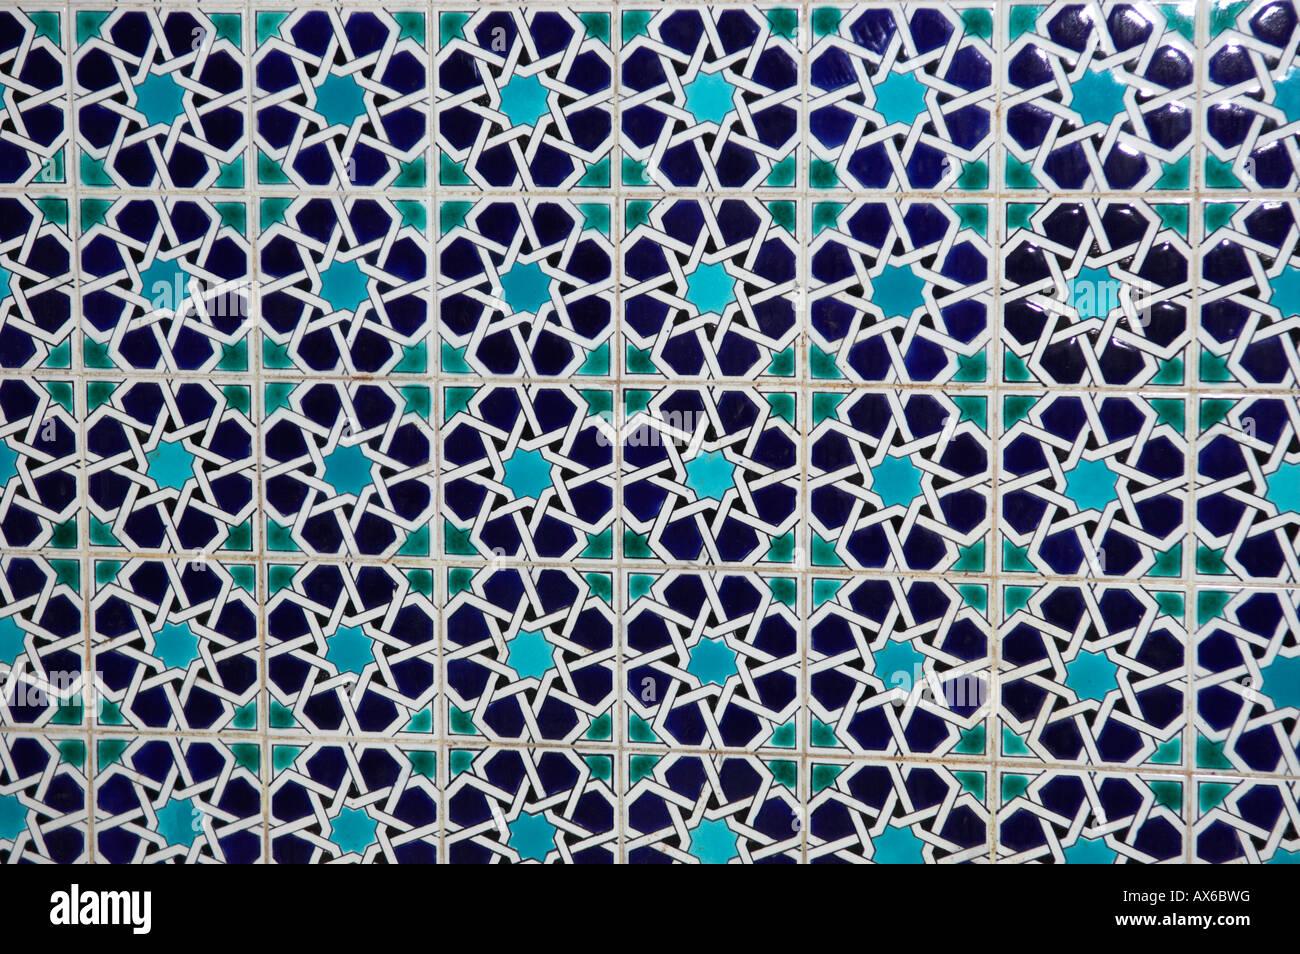 Moroccan geometric pattern royalty free stock photos image 13547078 - Geometric Pattern Of Islamic Tiles Muscat Oman Stock Photo Royalty 1300x954